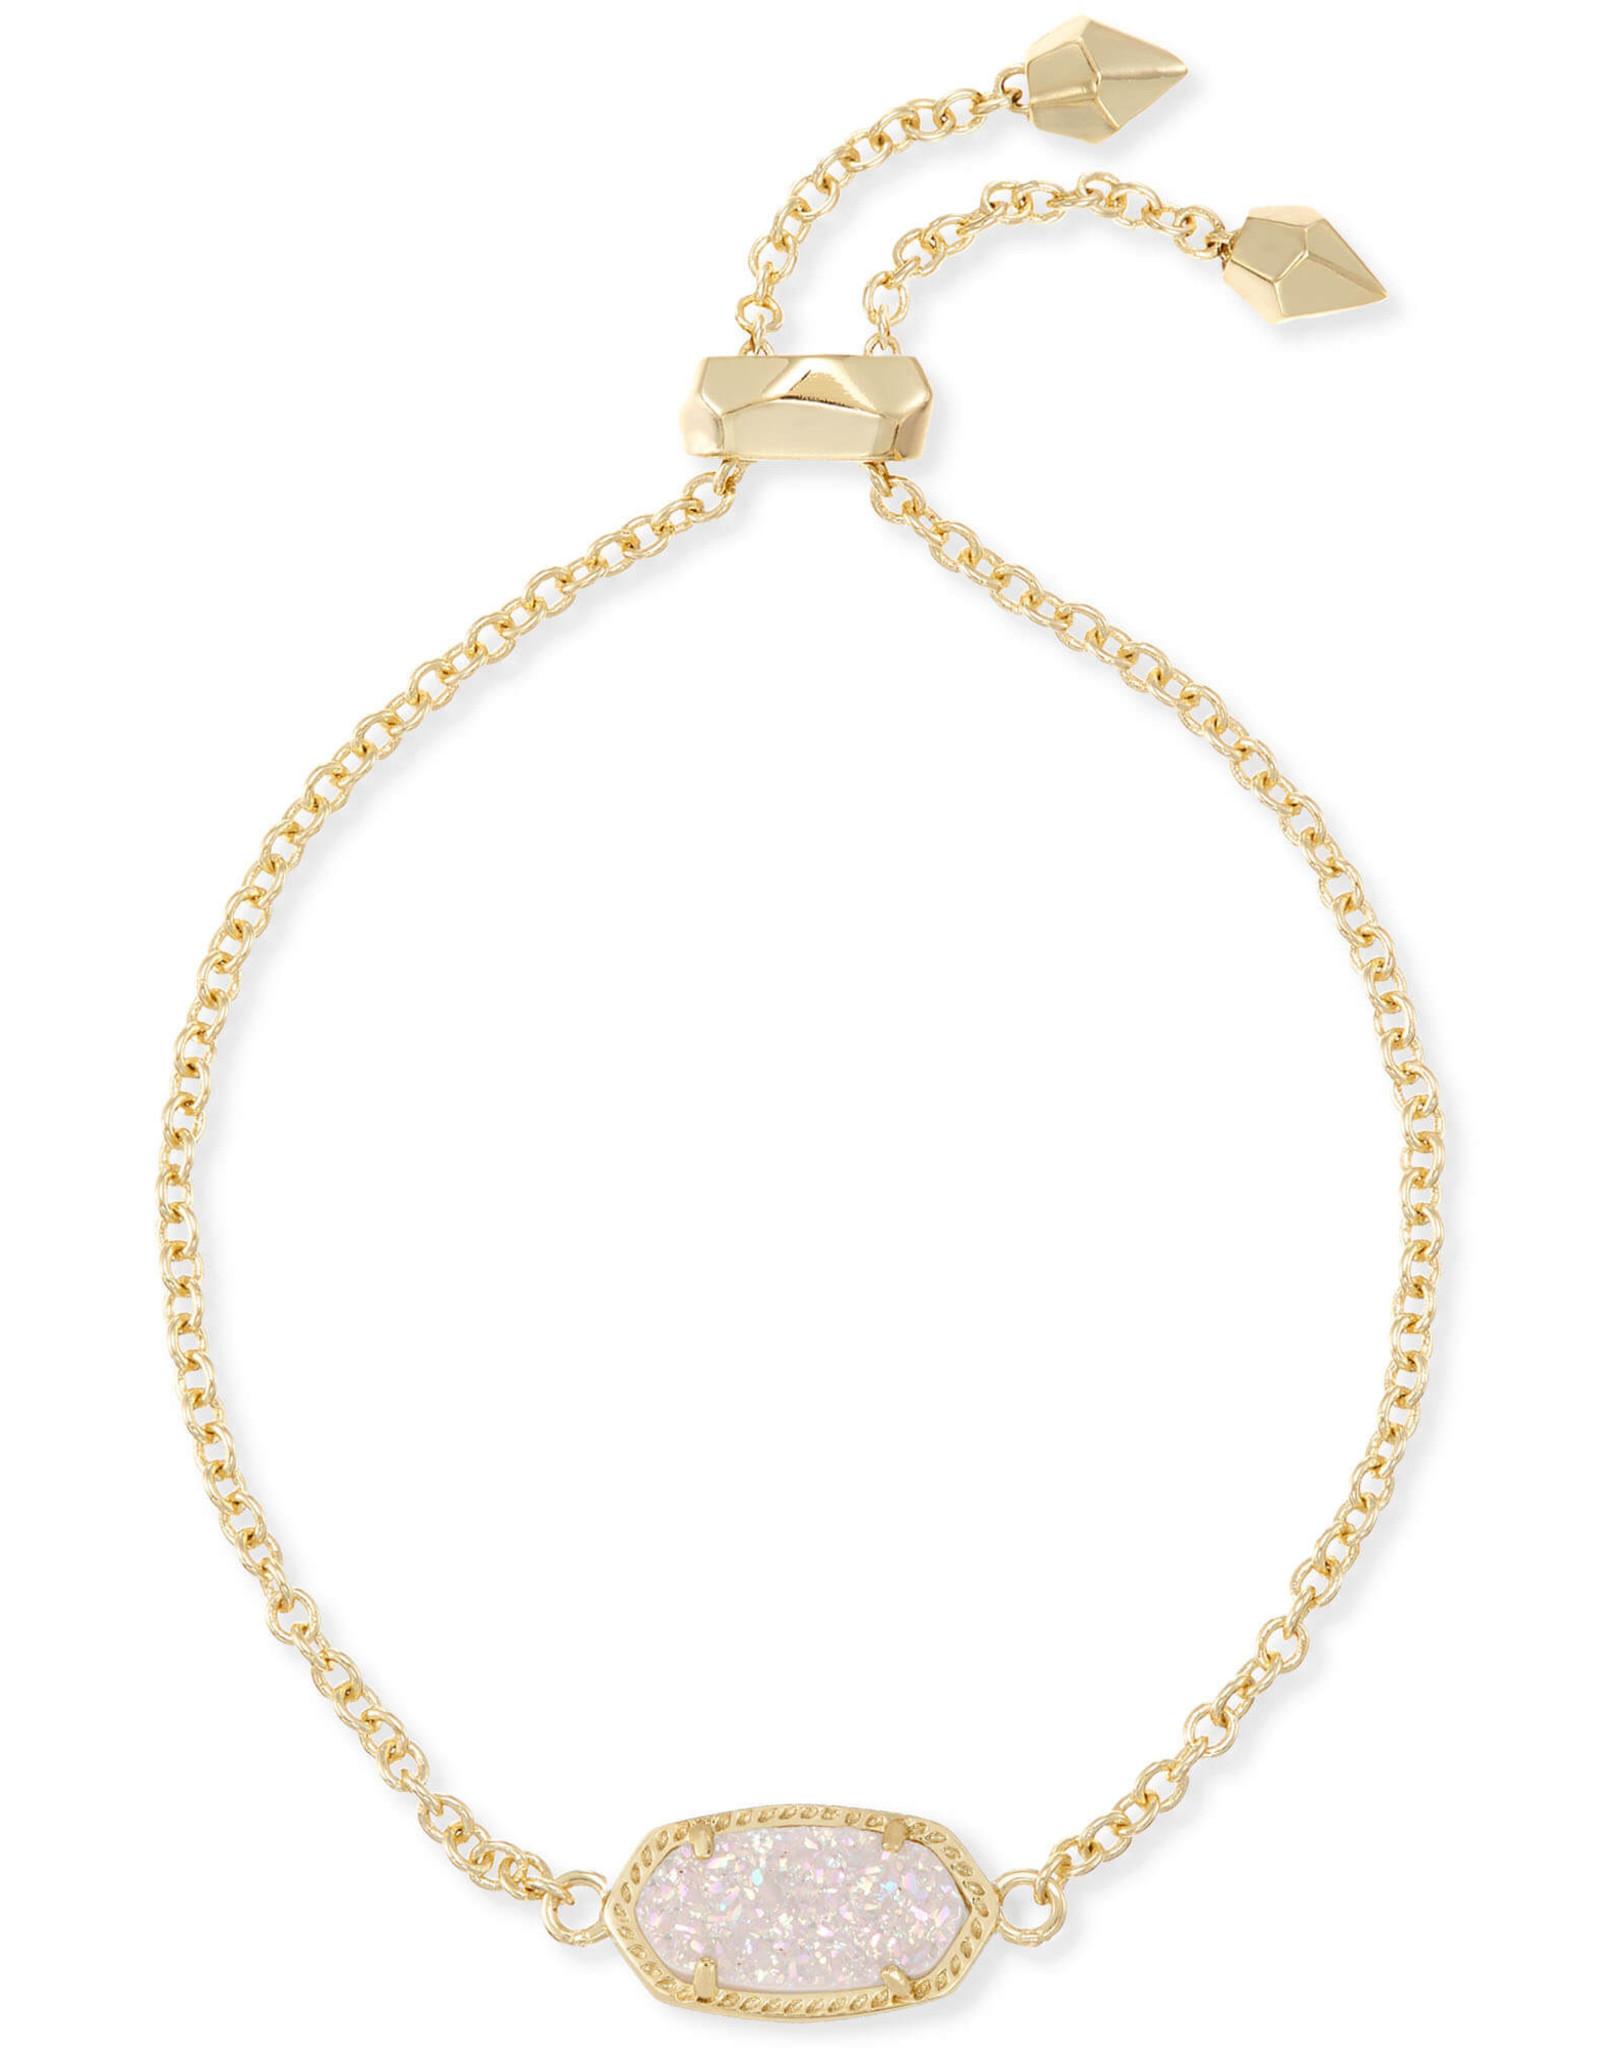 Kendra Scott Elaina Bracelet - Iridescent Drusy/Gold